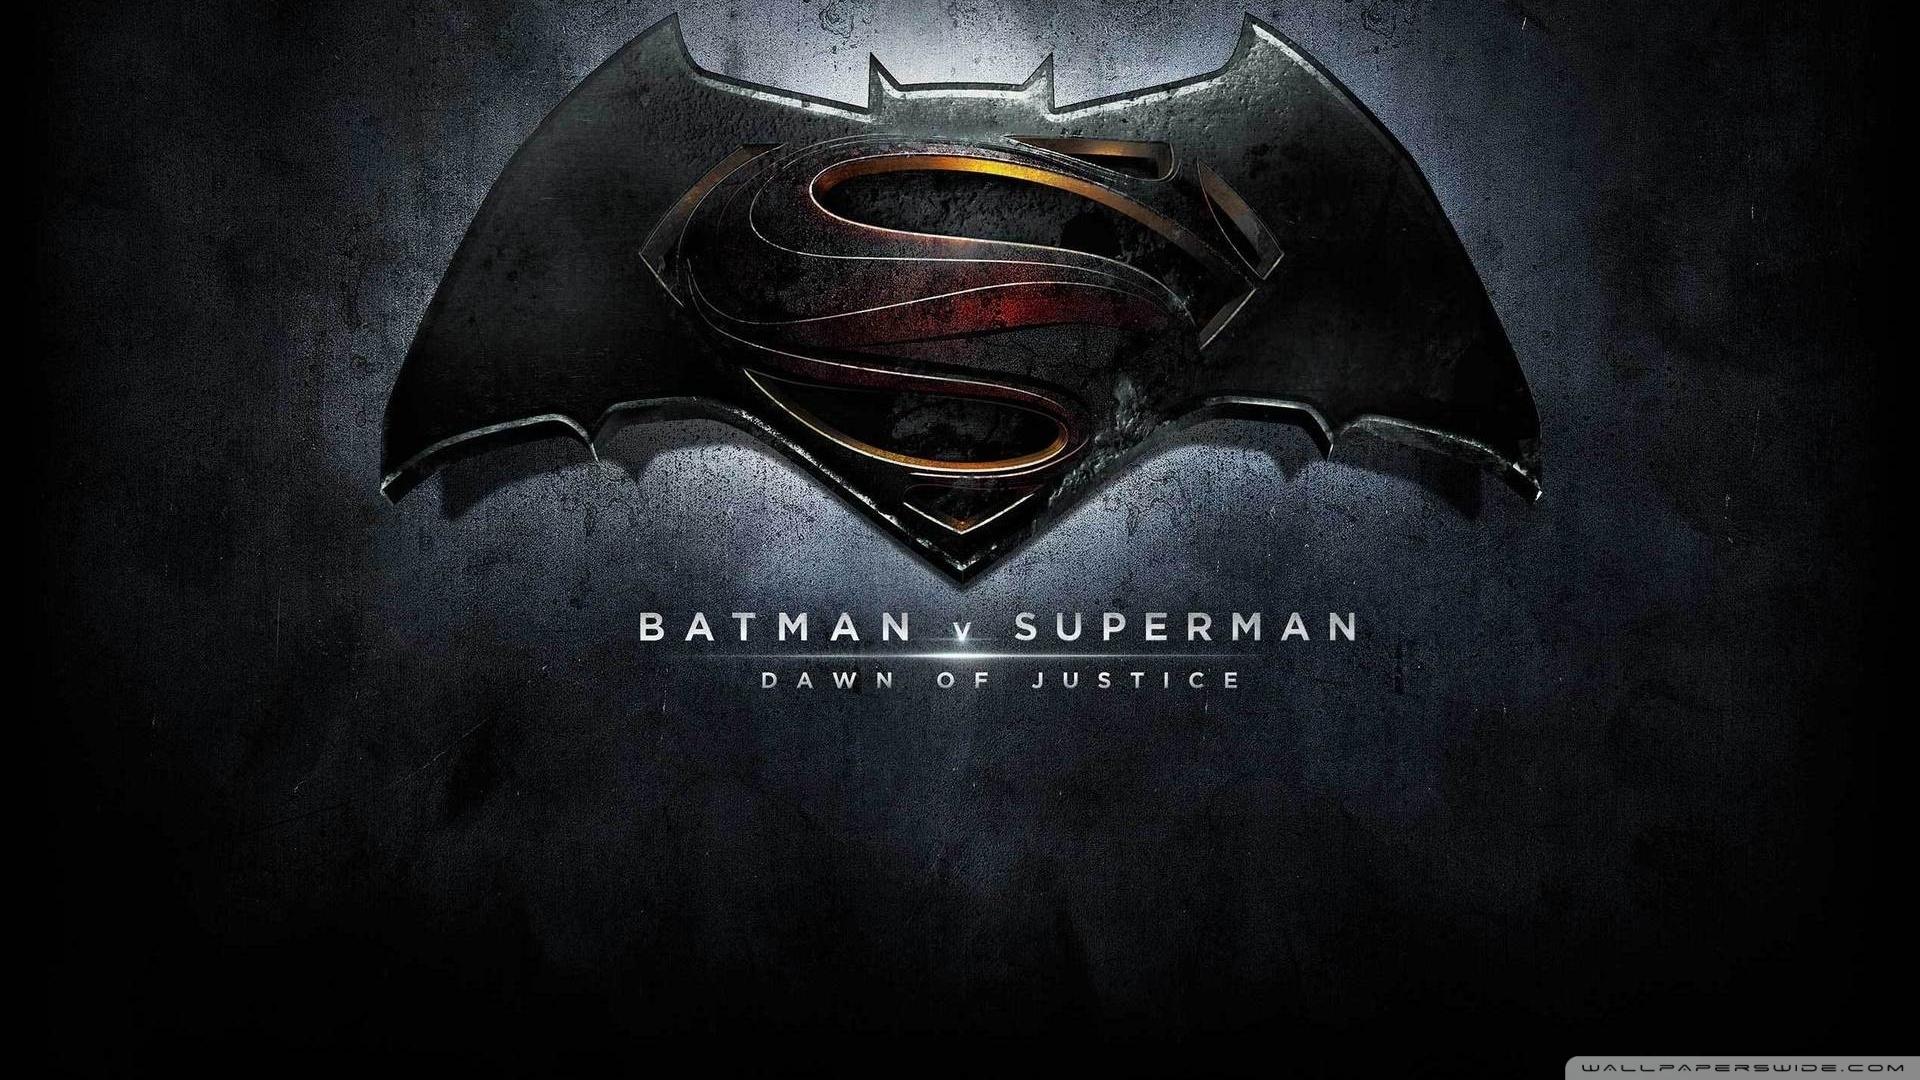 batman vs superman logo ❤ 4k hd desktop wallpaper for 4k ultra hd